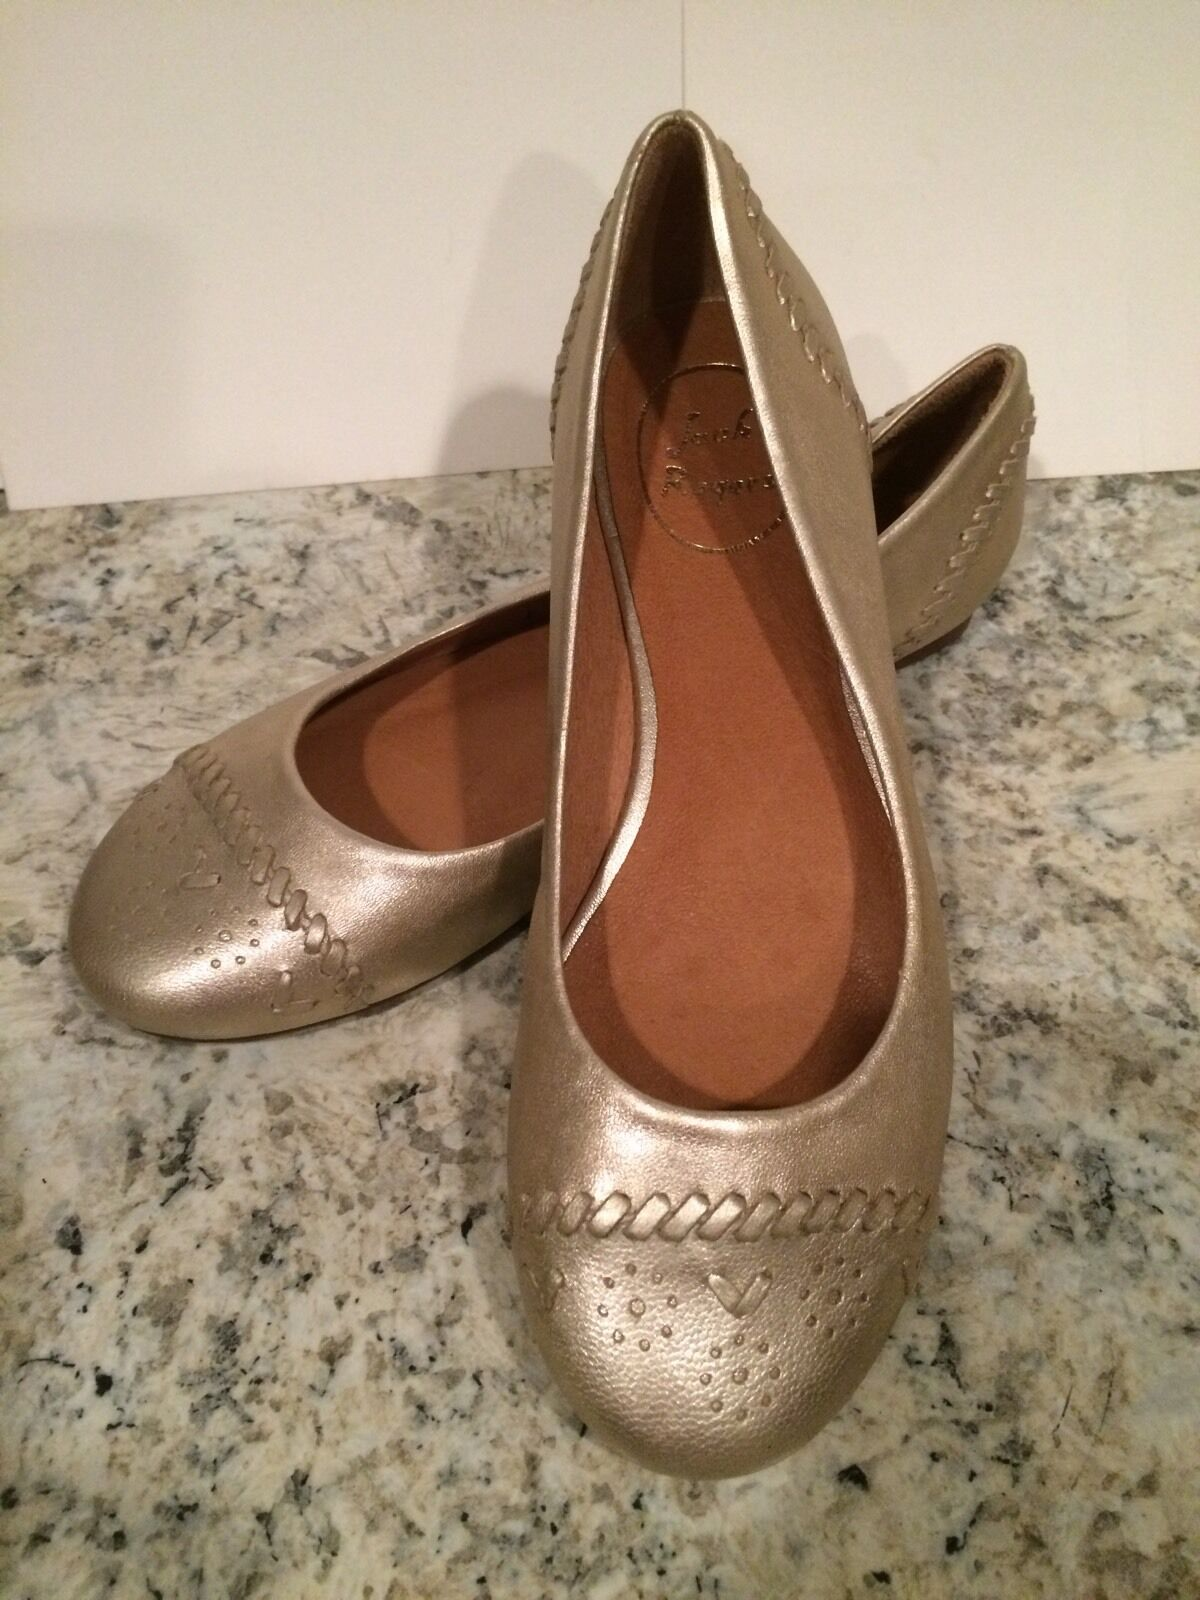 Jack Rogers Delfino Ballet Flat Schuhes Leder Round Toe Platinum Metallic 6.5 M